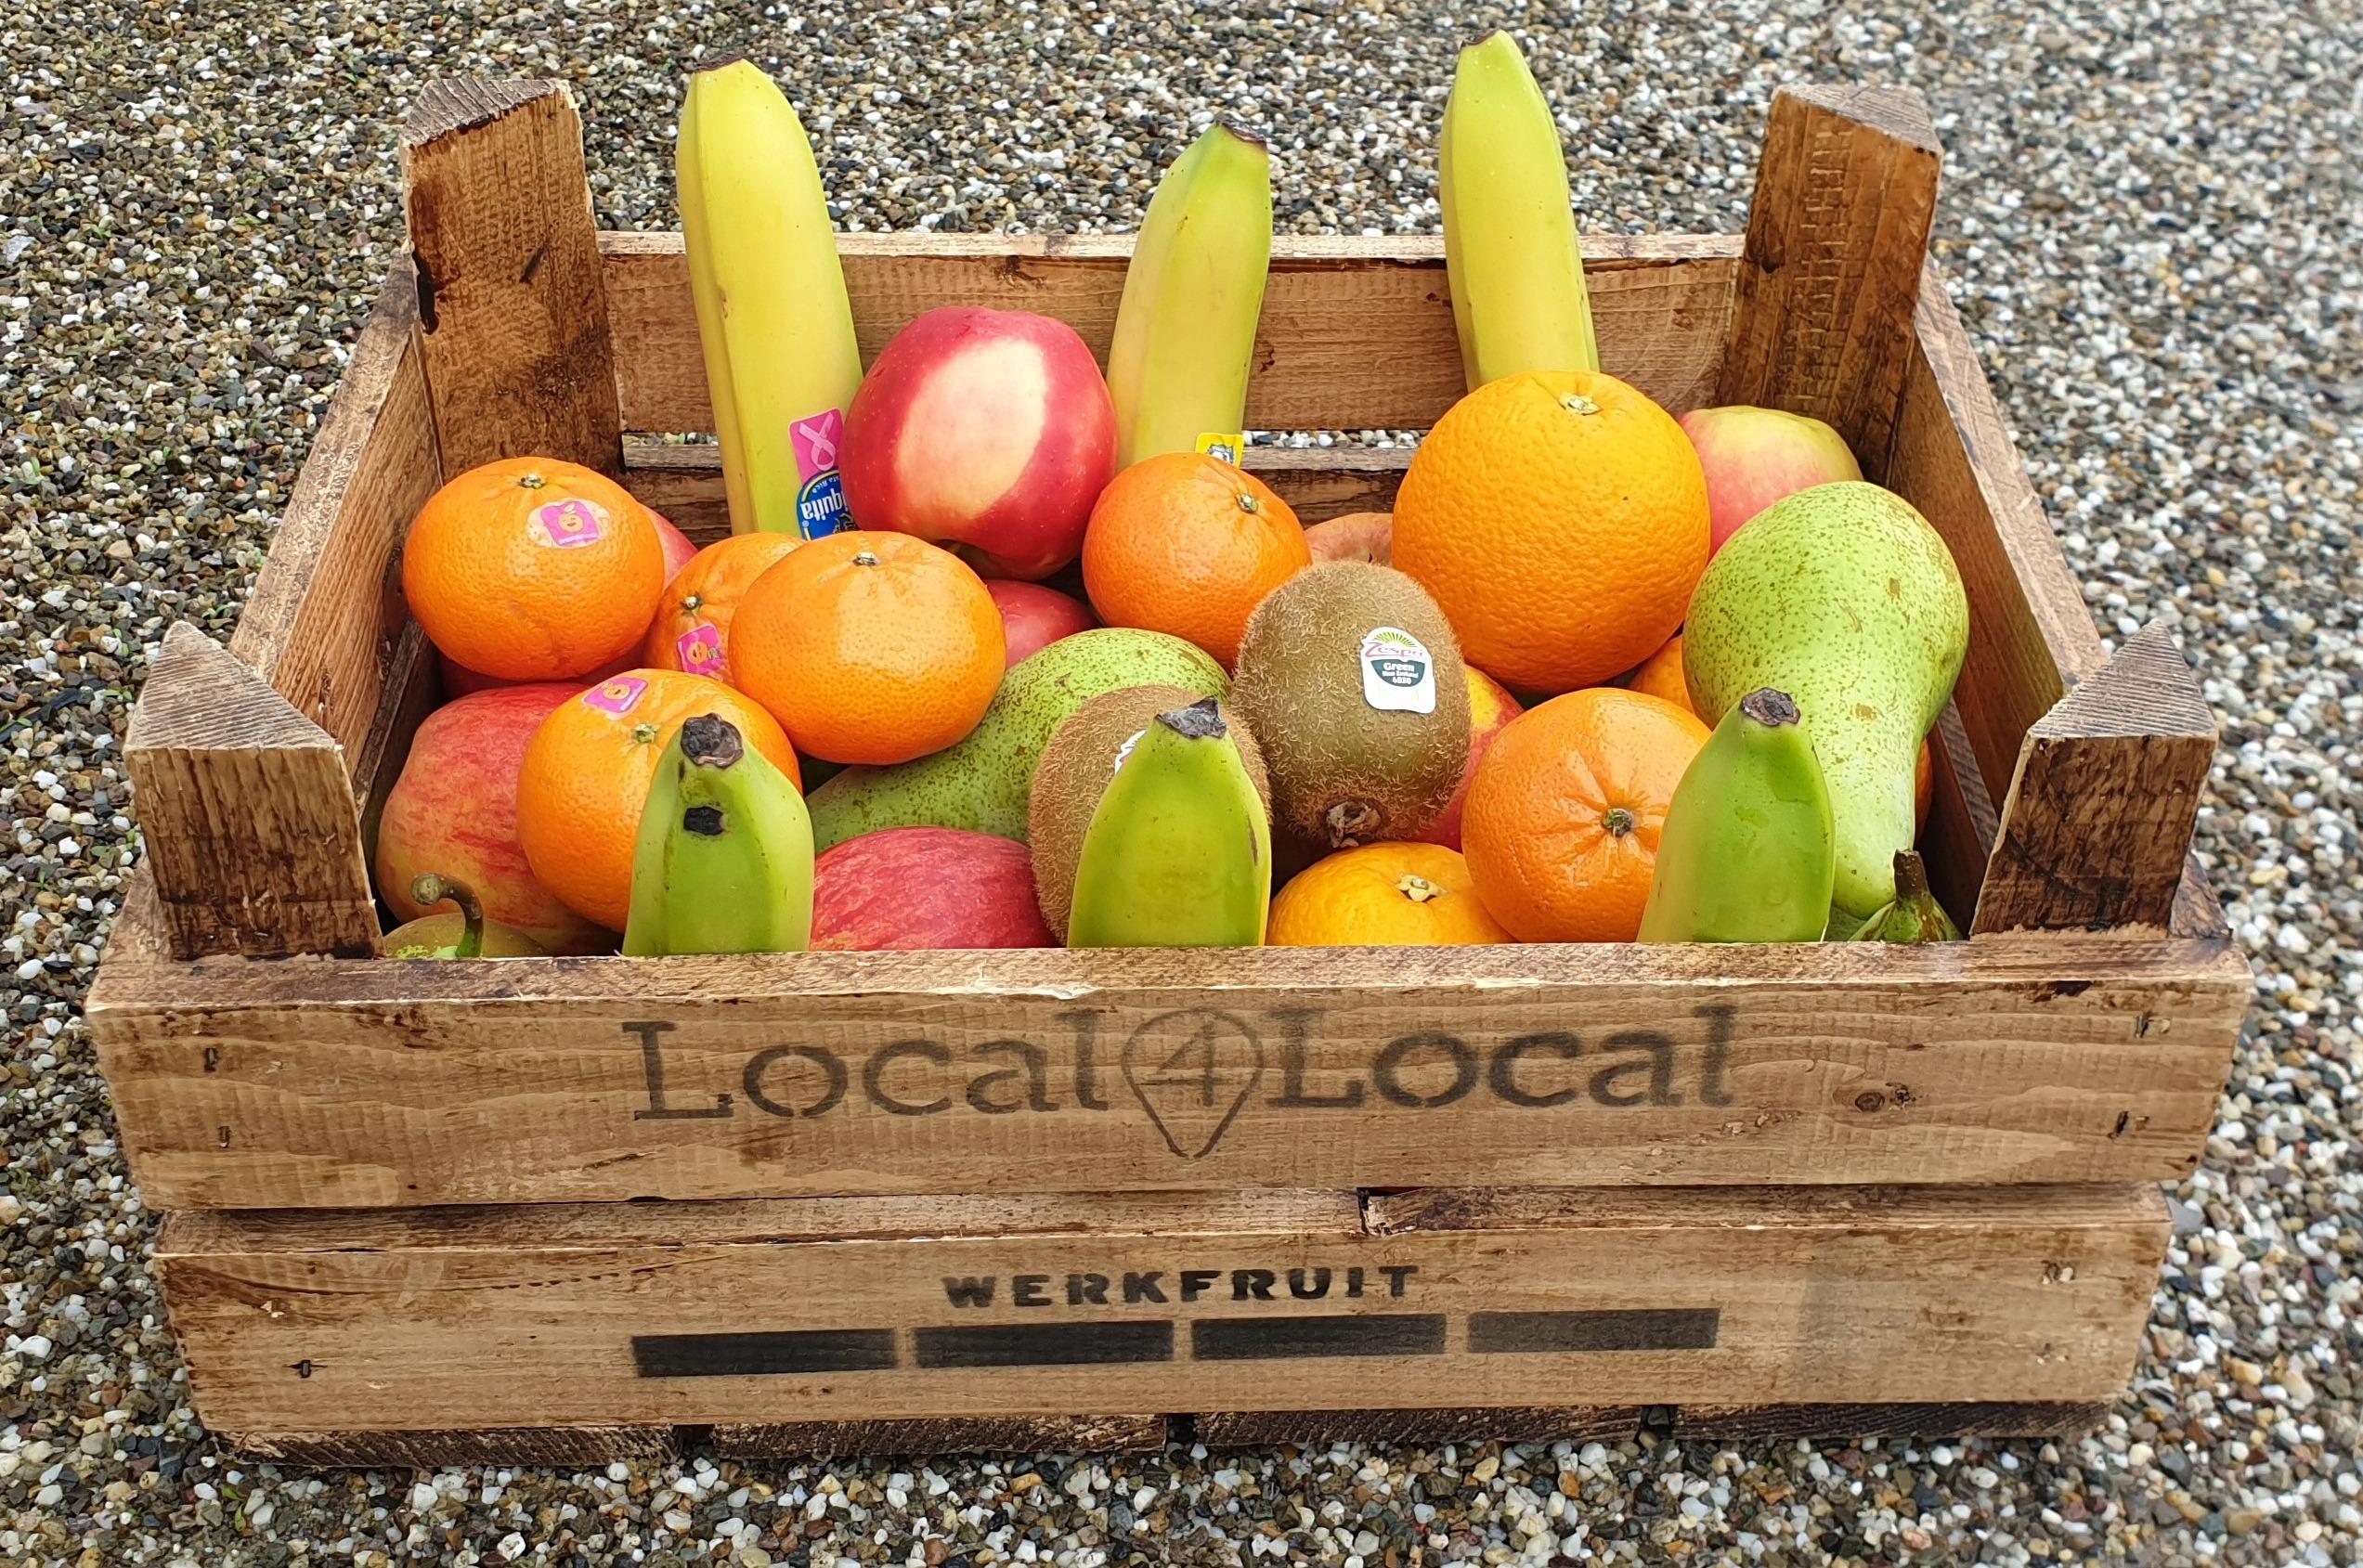 Werkfruit local 4 local basis 30 stuks